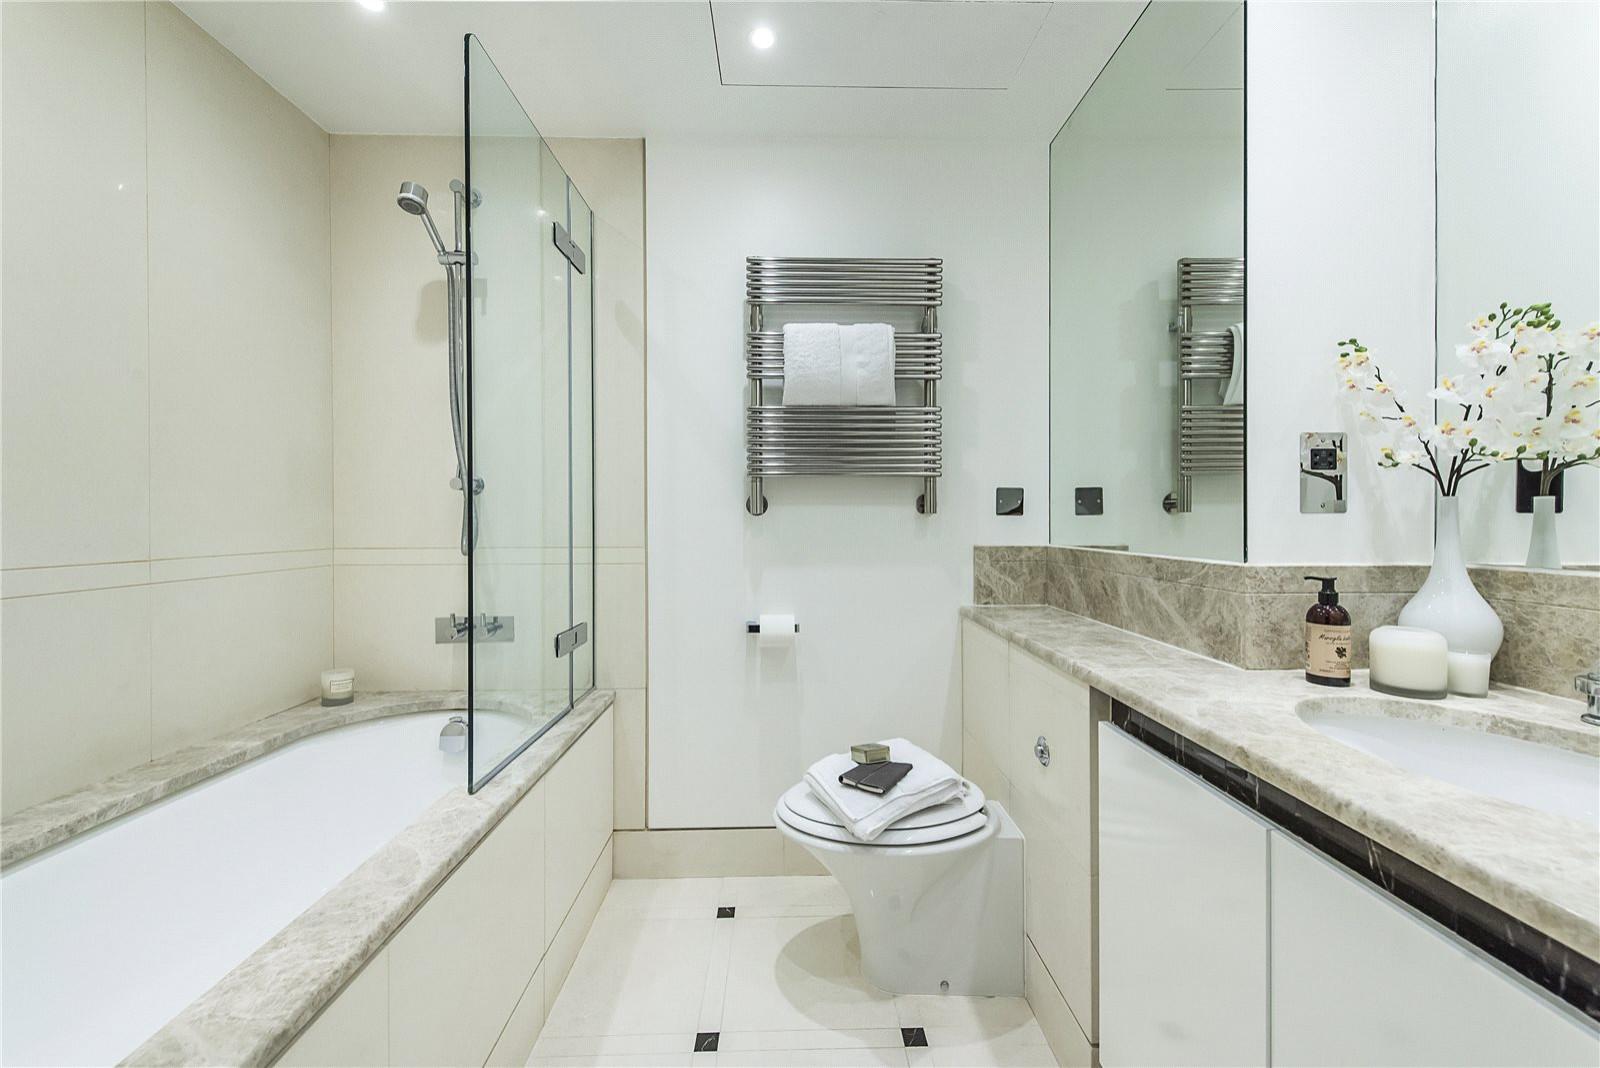 Knightsbridge Apartments